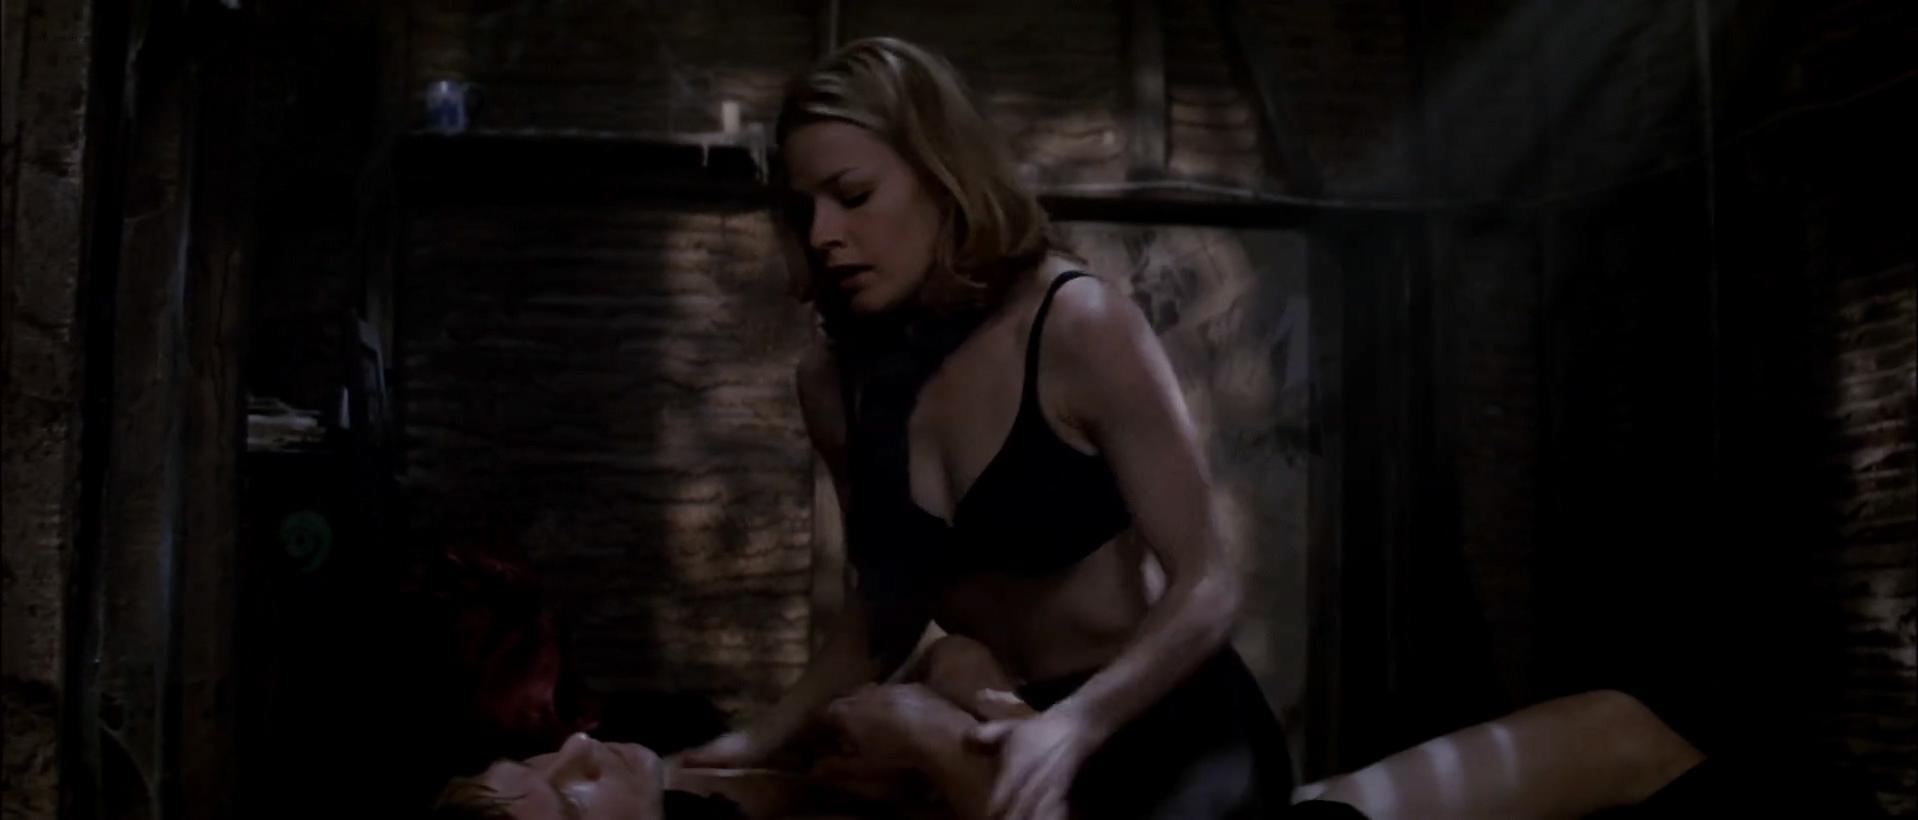 Elizabeth shue hot and nude pics-9725